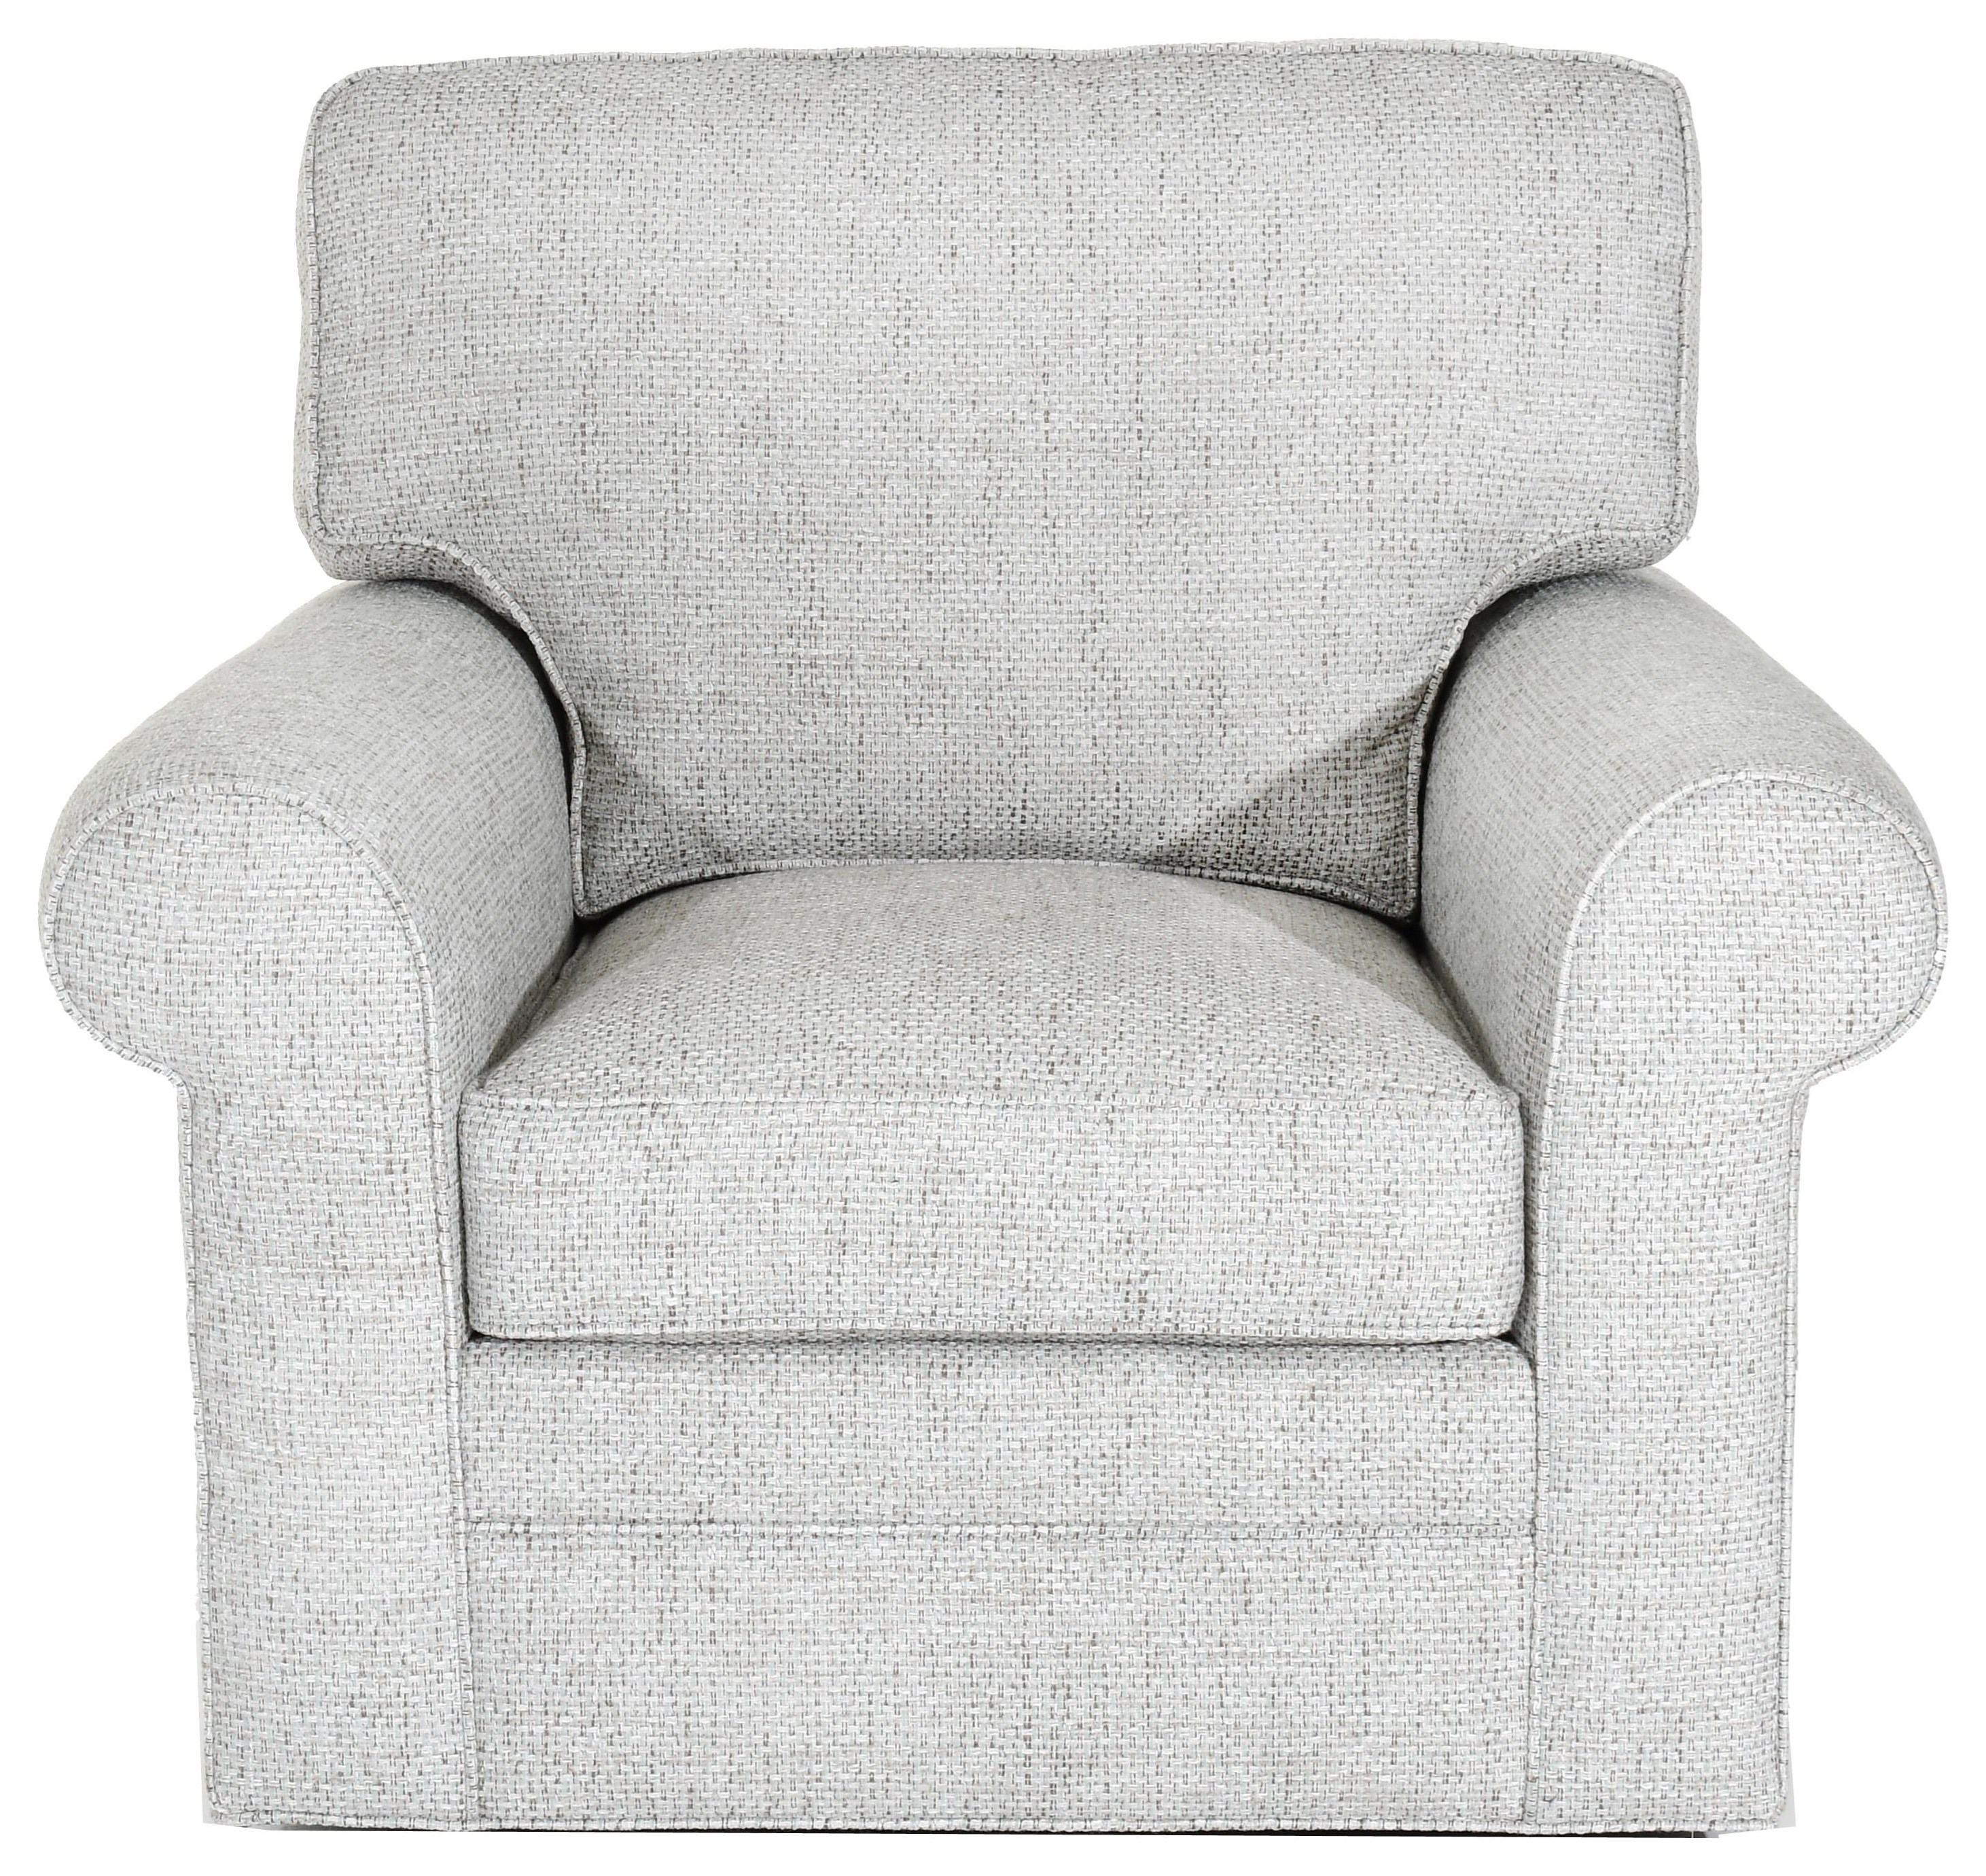 Attirant Sherrill Design Your OwnCustomizable Swivel Chair ...